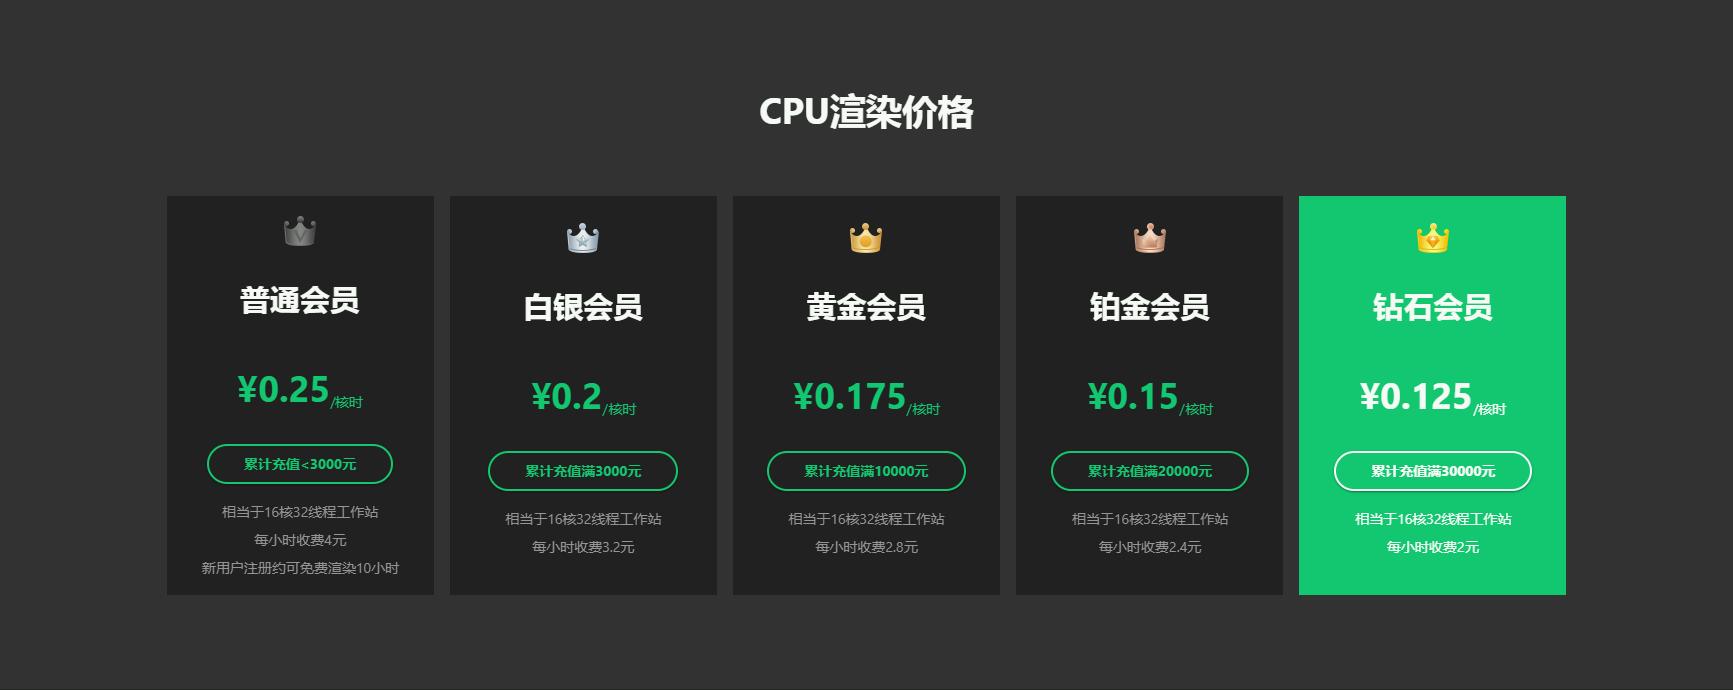 CPU渲染费用-瑞云渲染